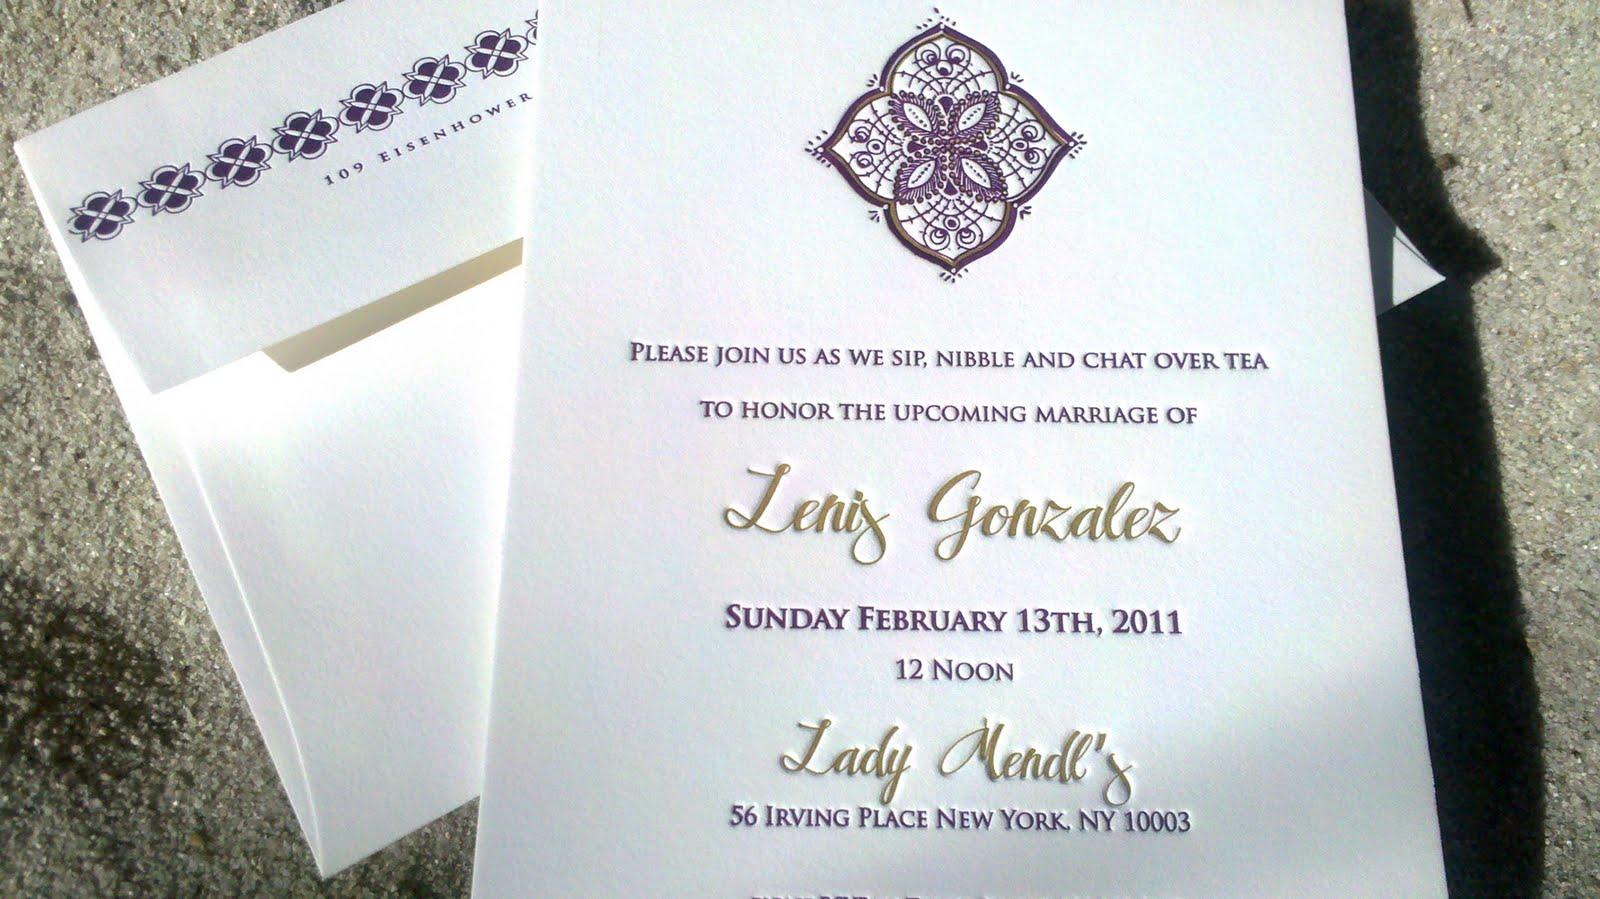 Illustrationletterpress bridal shower invitation letterpress bridal shower invitation letterpress filmwisefo